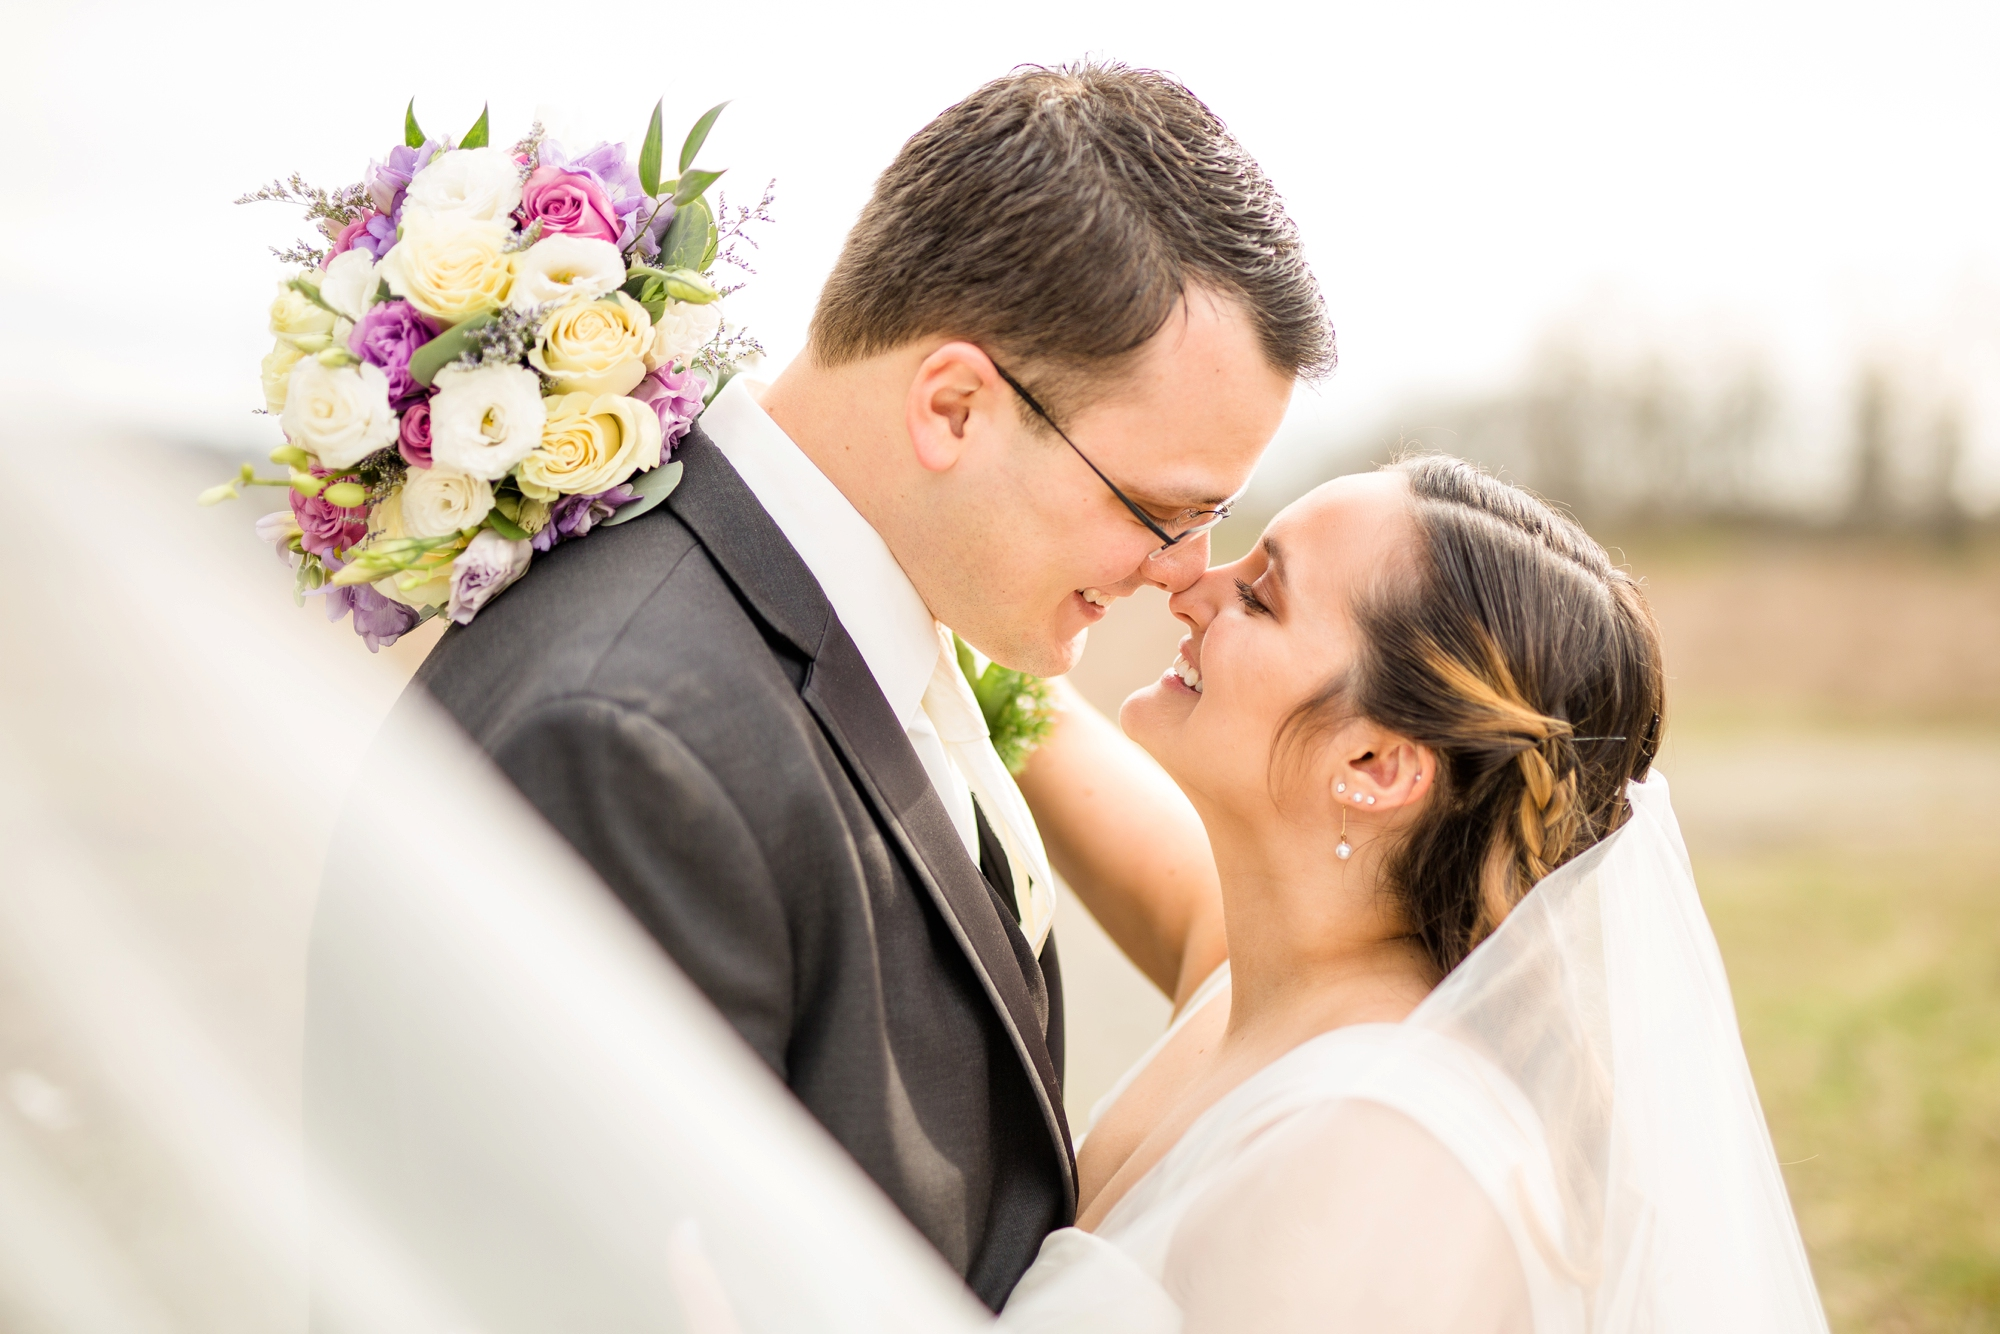 pittsburgh wedding photographer, pittsburgh wedding venues, pittsburgh wedding photos, pittsburgh marriott north wedding photos